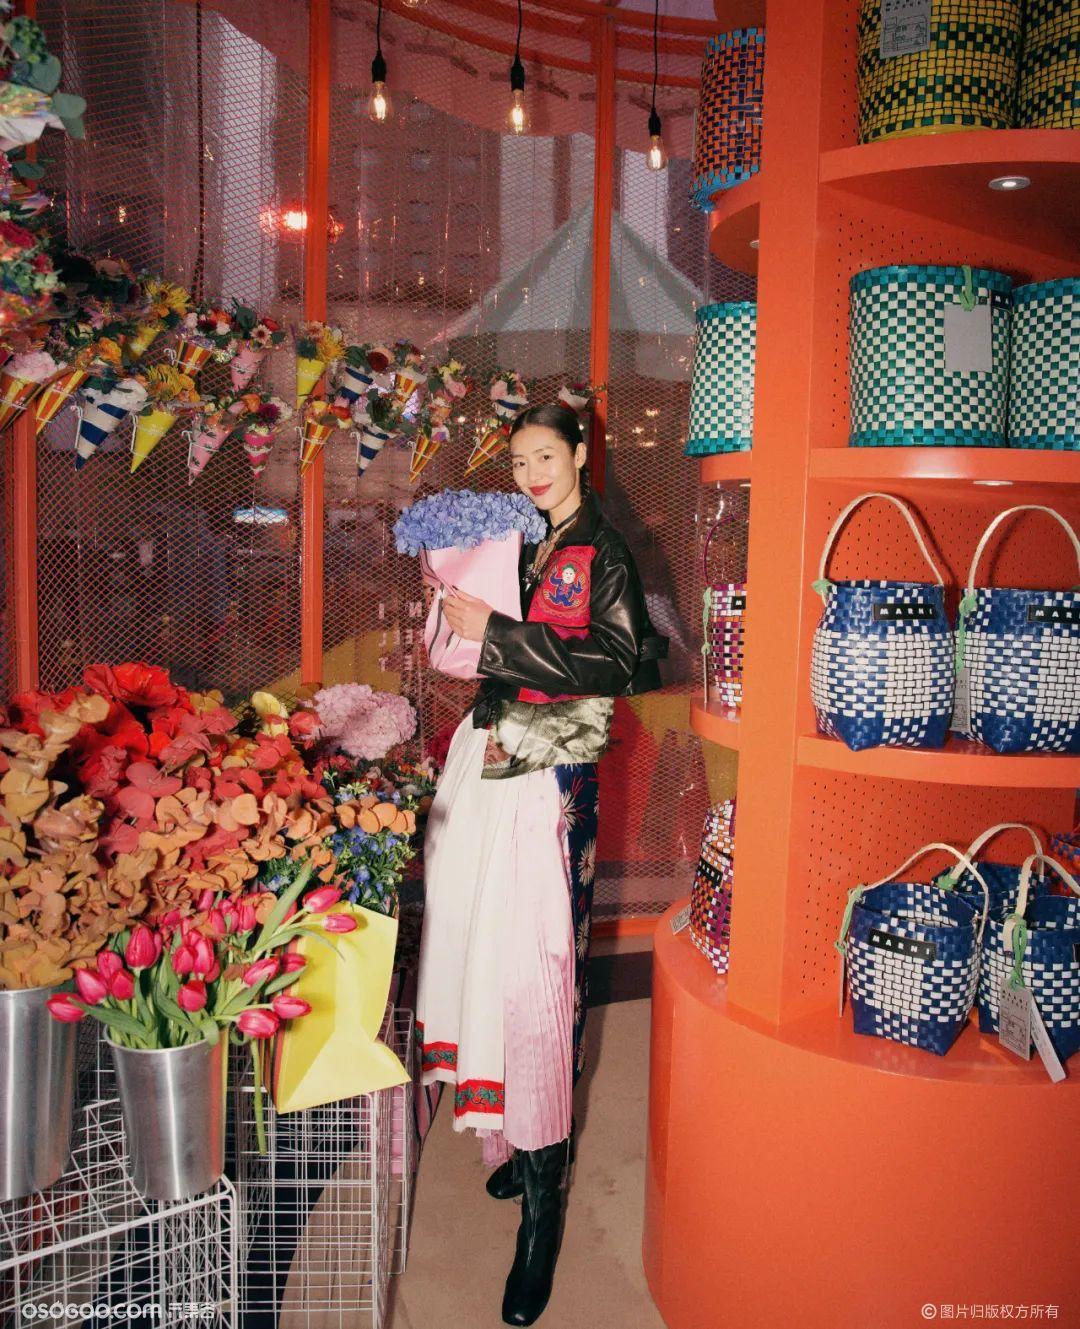 Marni Market 马戏团嘉年华